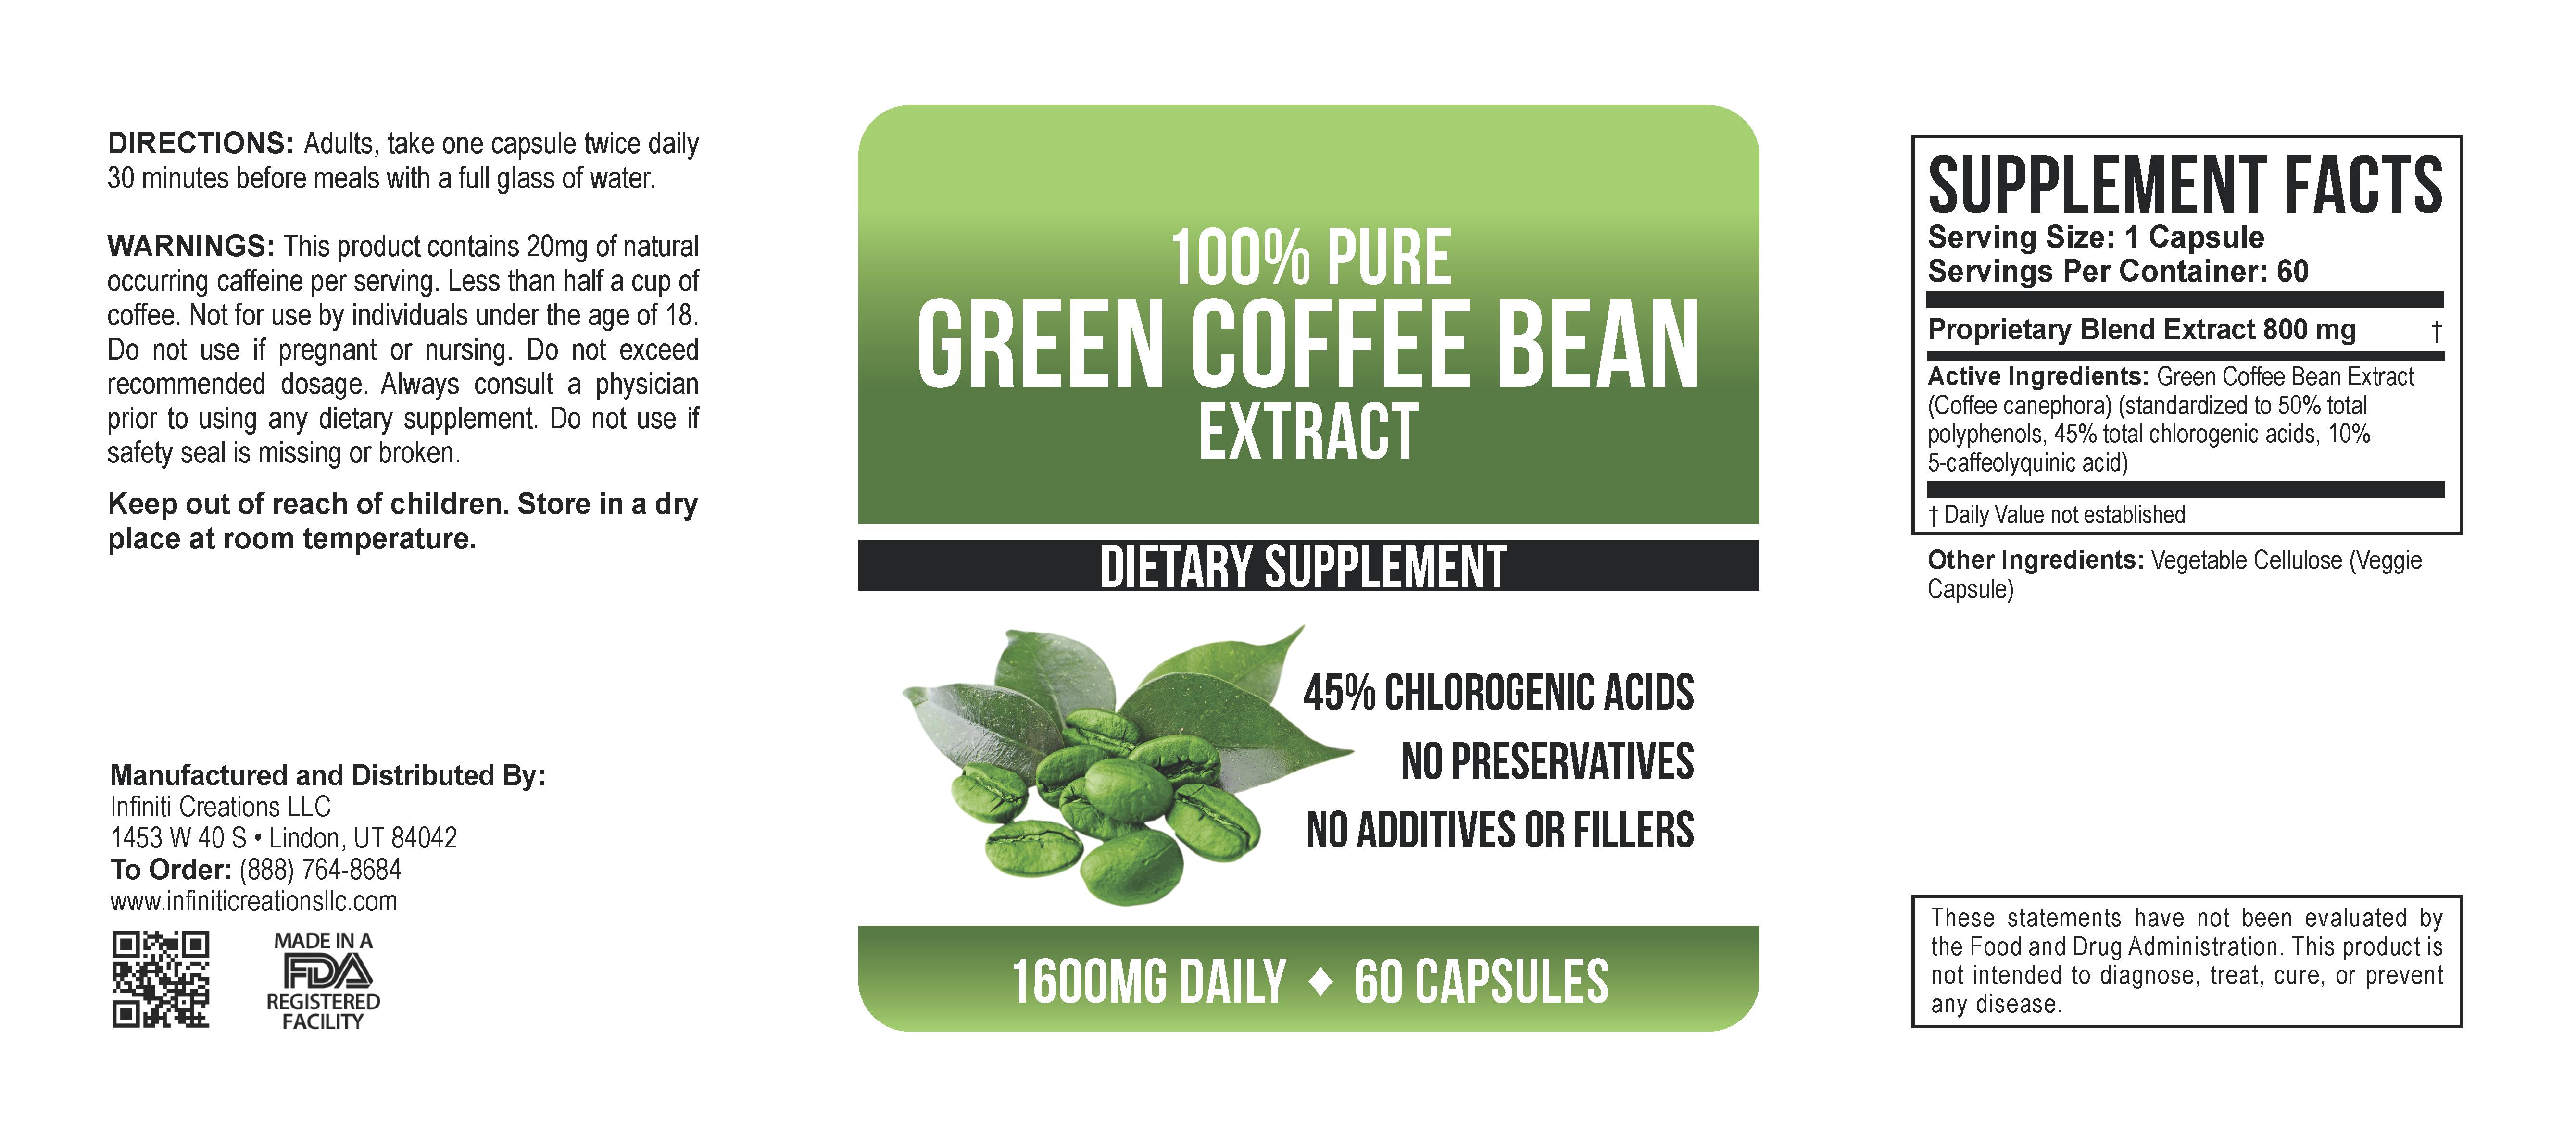 infiniti-creations-green-coffee-bean-60ct-v2.0.png